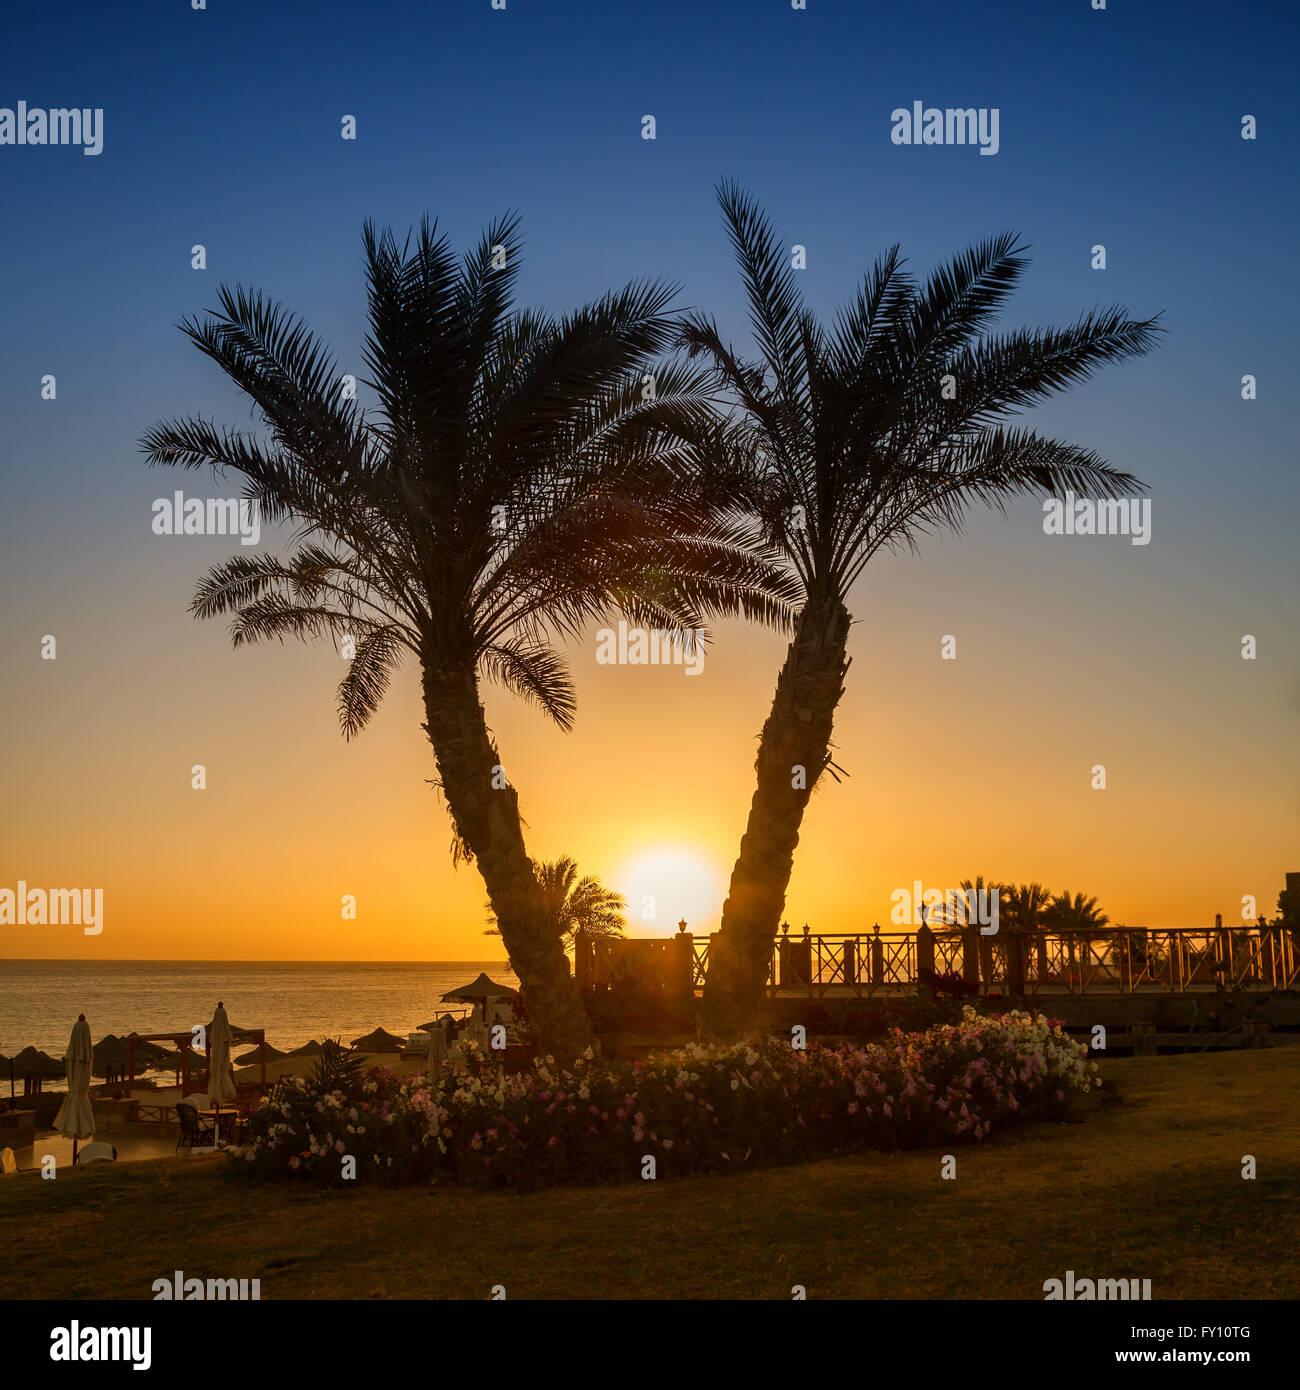 Sunrise over the Red sea, Marsa Alam, Egypt - Stock Image